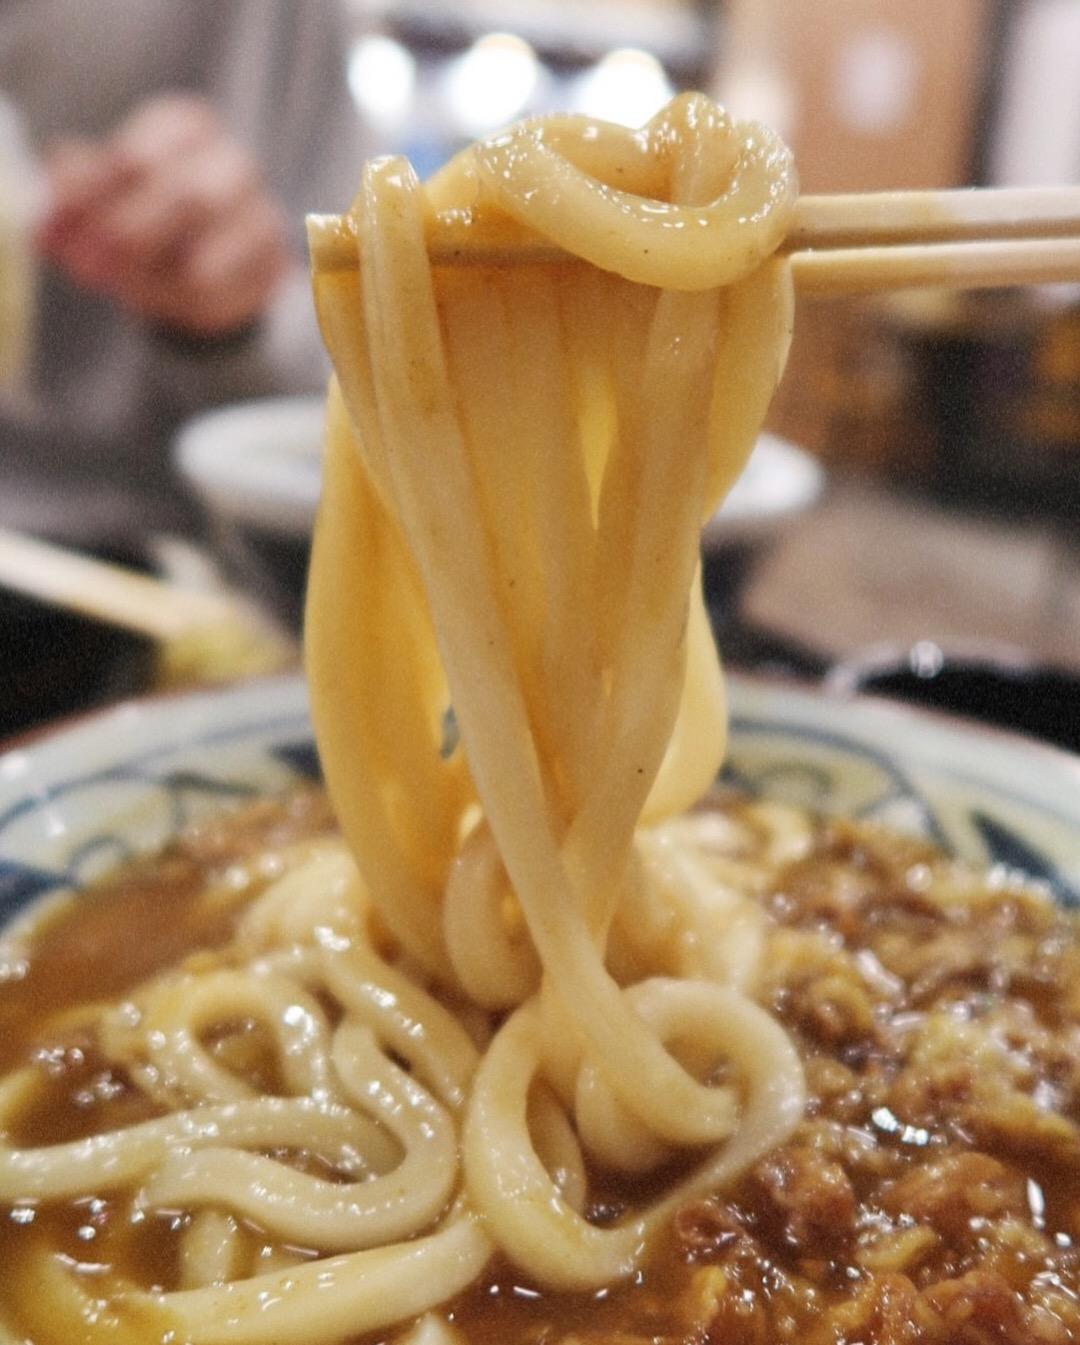 A close up shot of Marugame Udon's curry noodle udon bowl with al dente-style noodles.